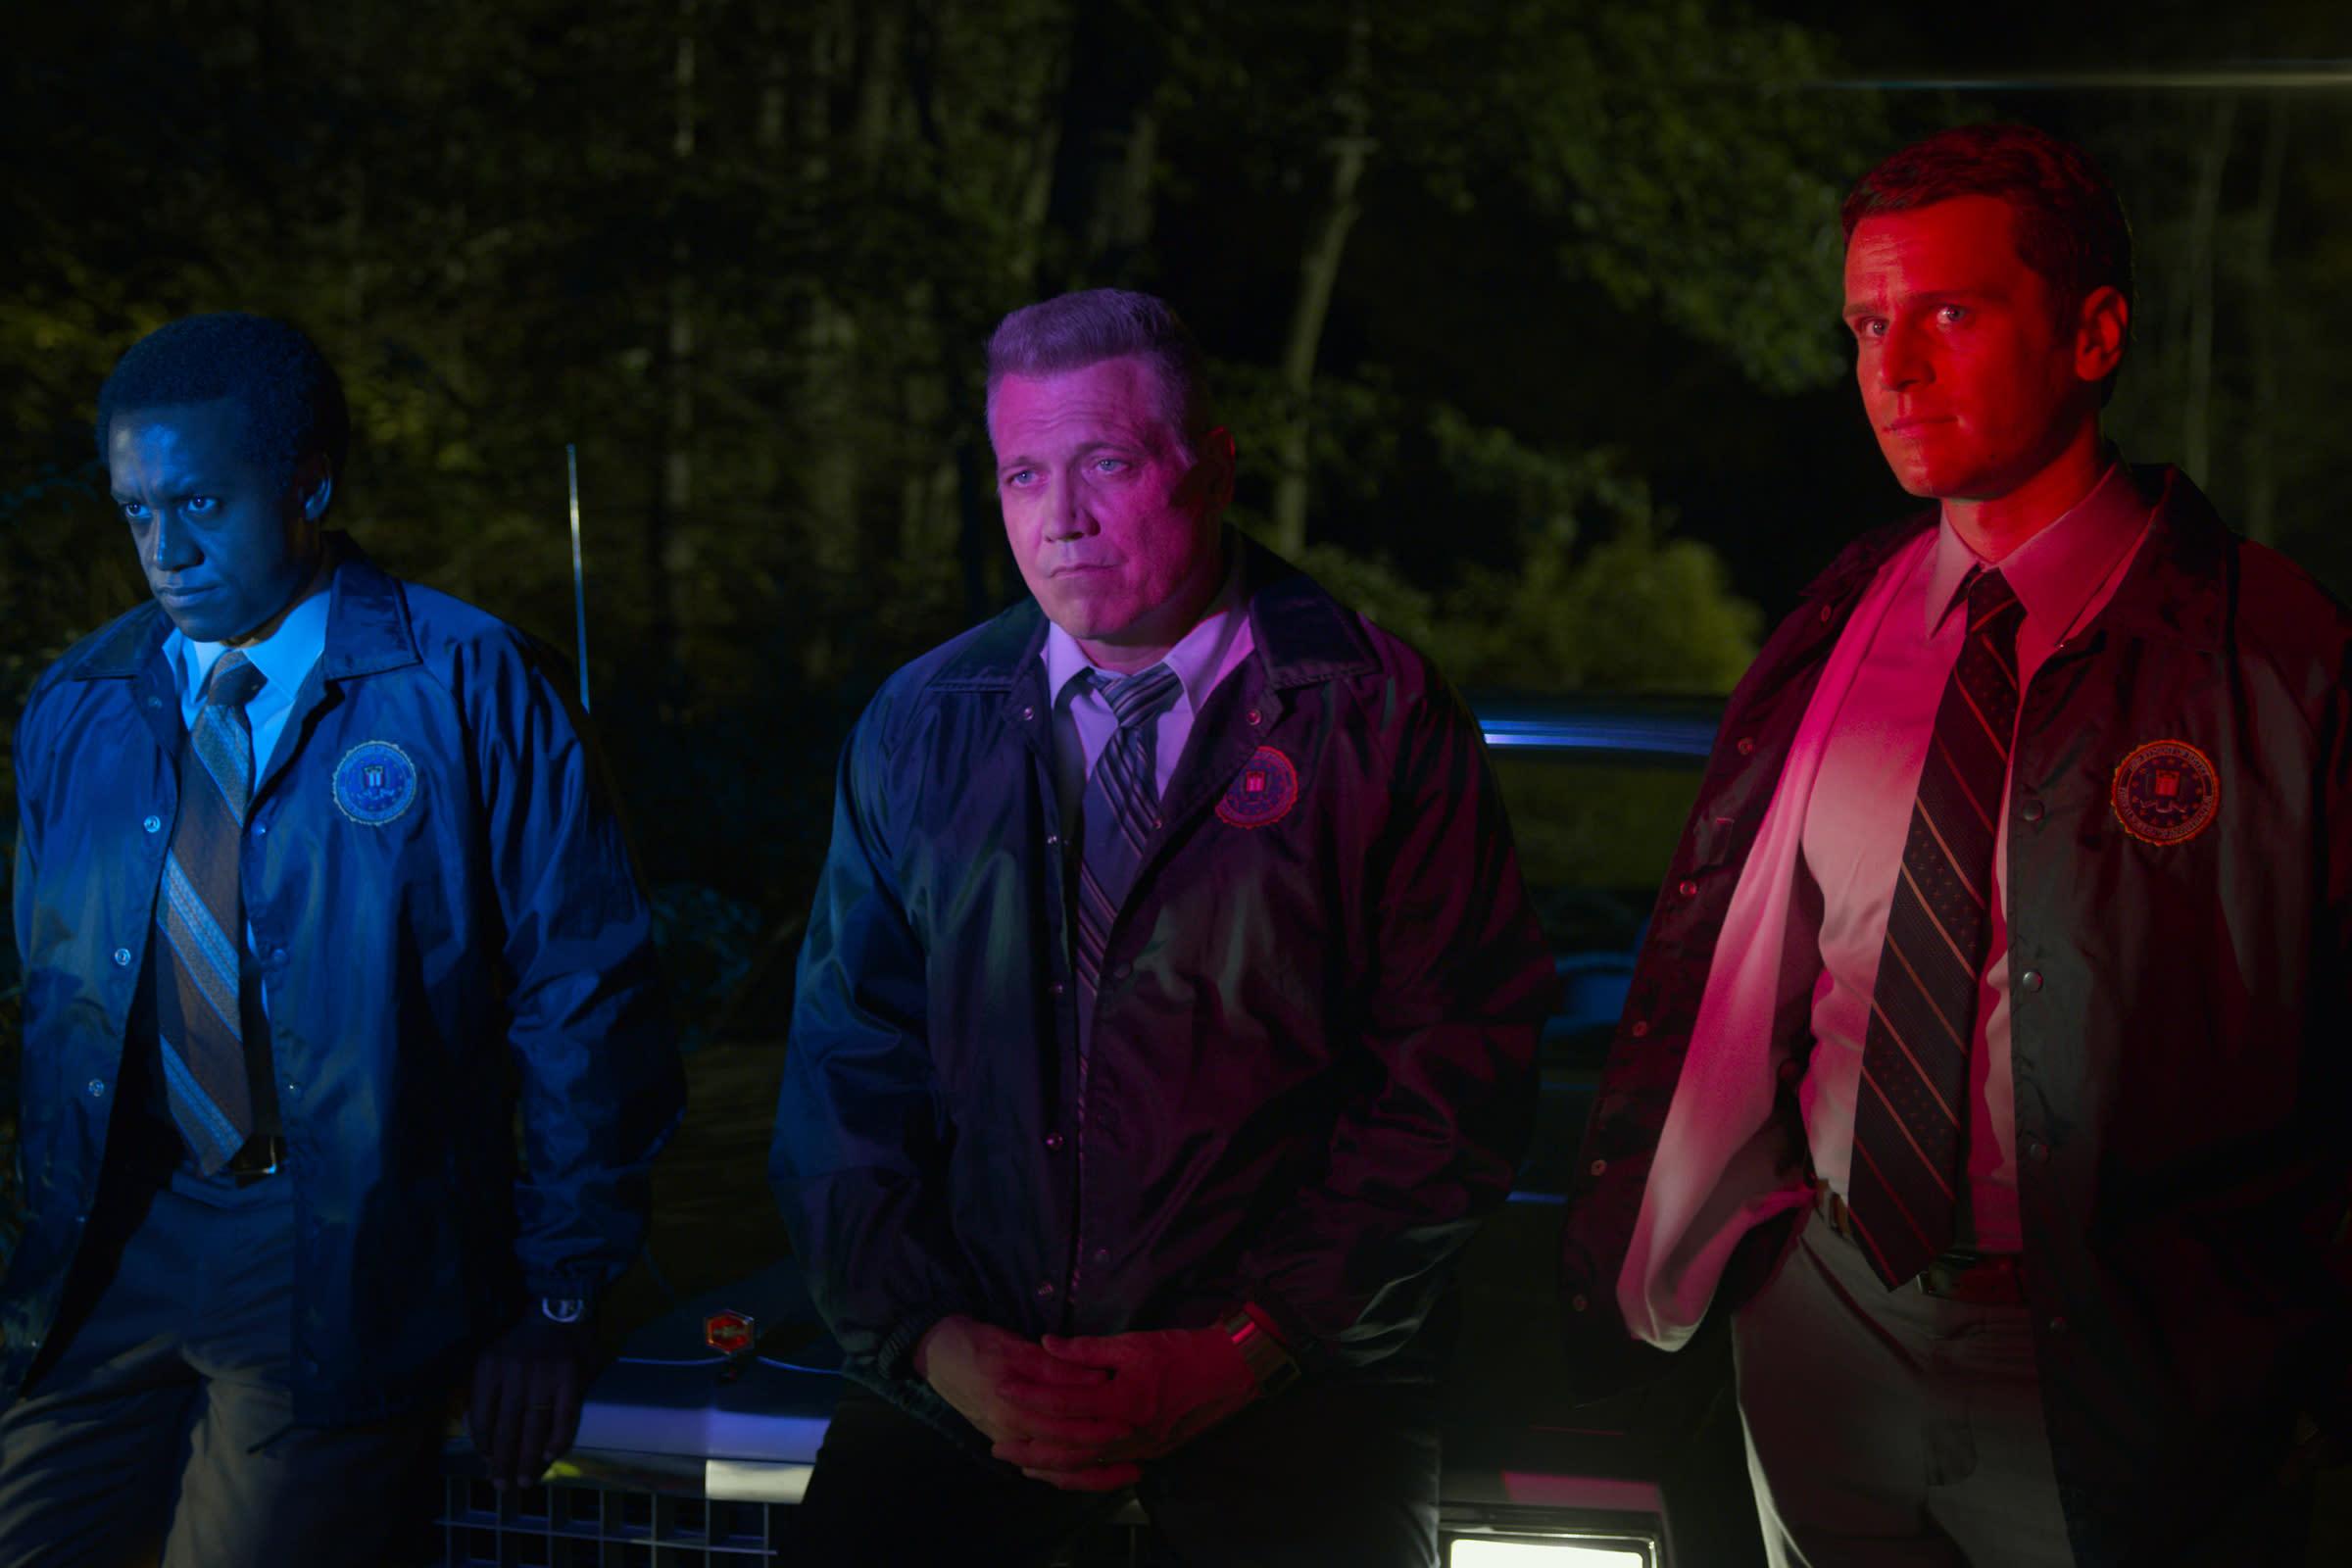 Mindhunter' Season 2: A Killer Instinct Slightly Softened